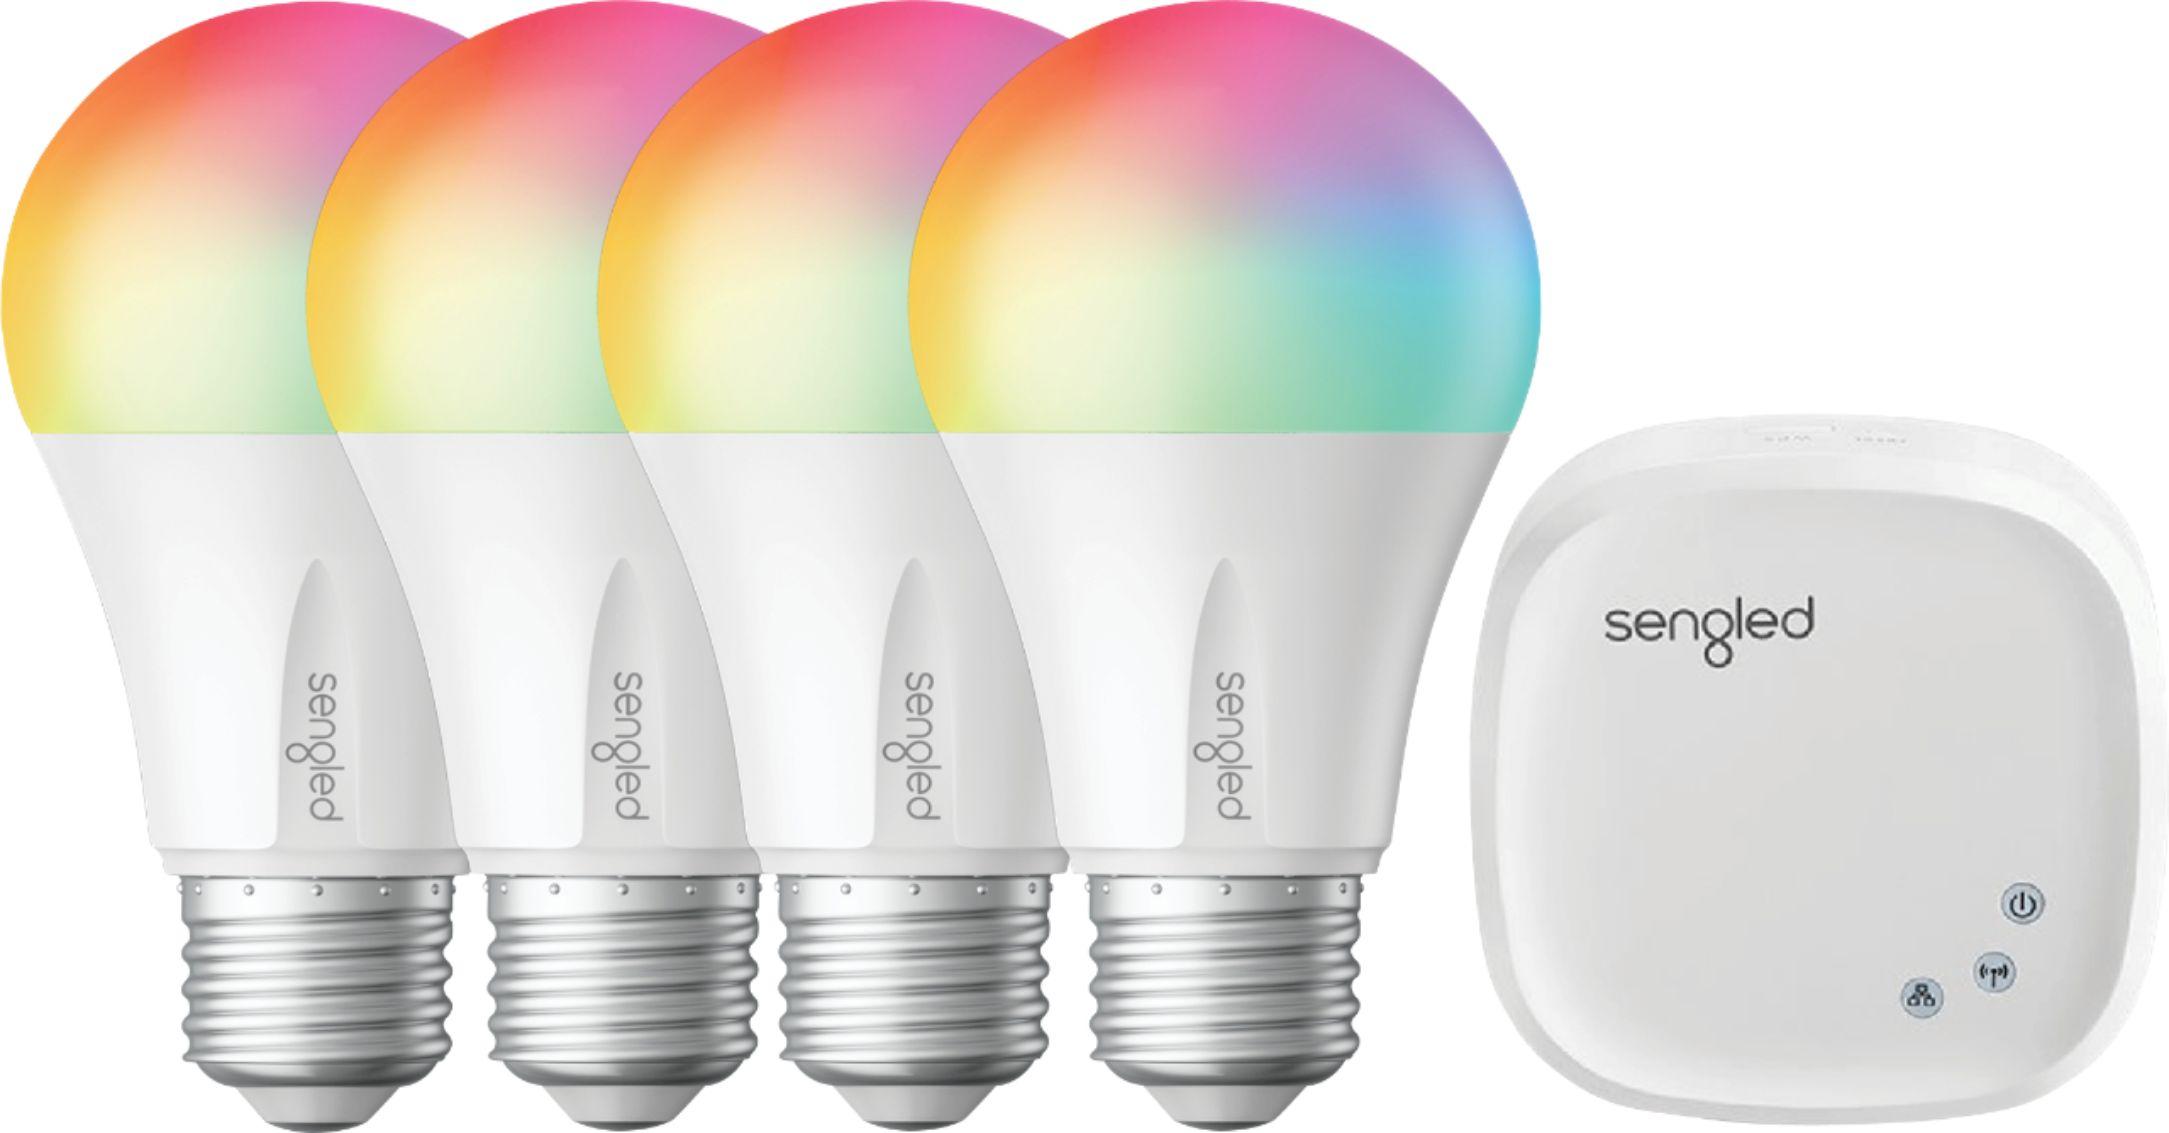 Sengled - Smart LED Multicolor A19 Starter Kit (4-Pack) - Multicolor $69.99